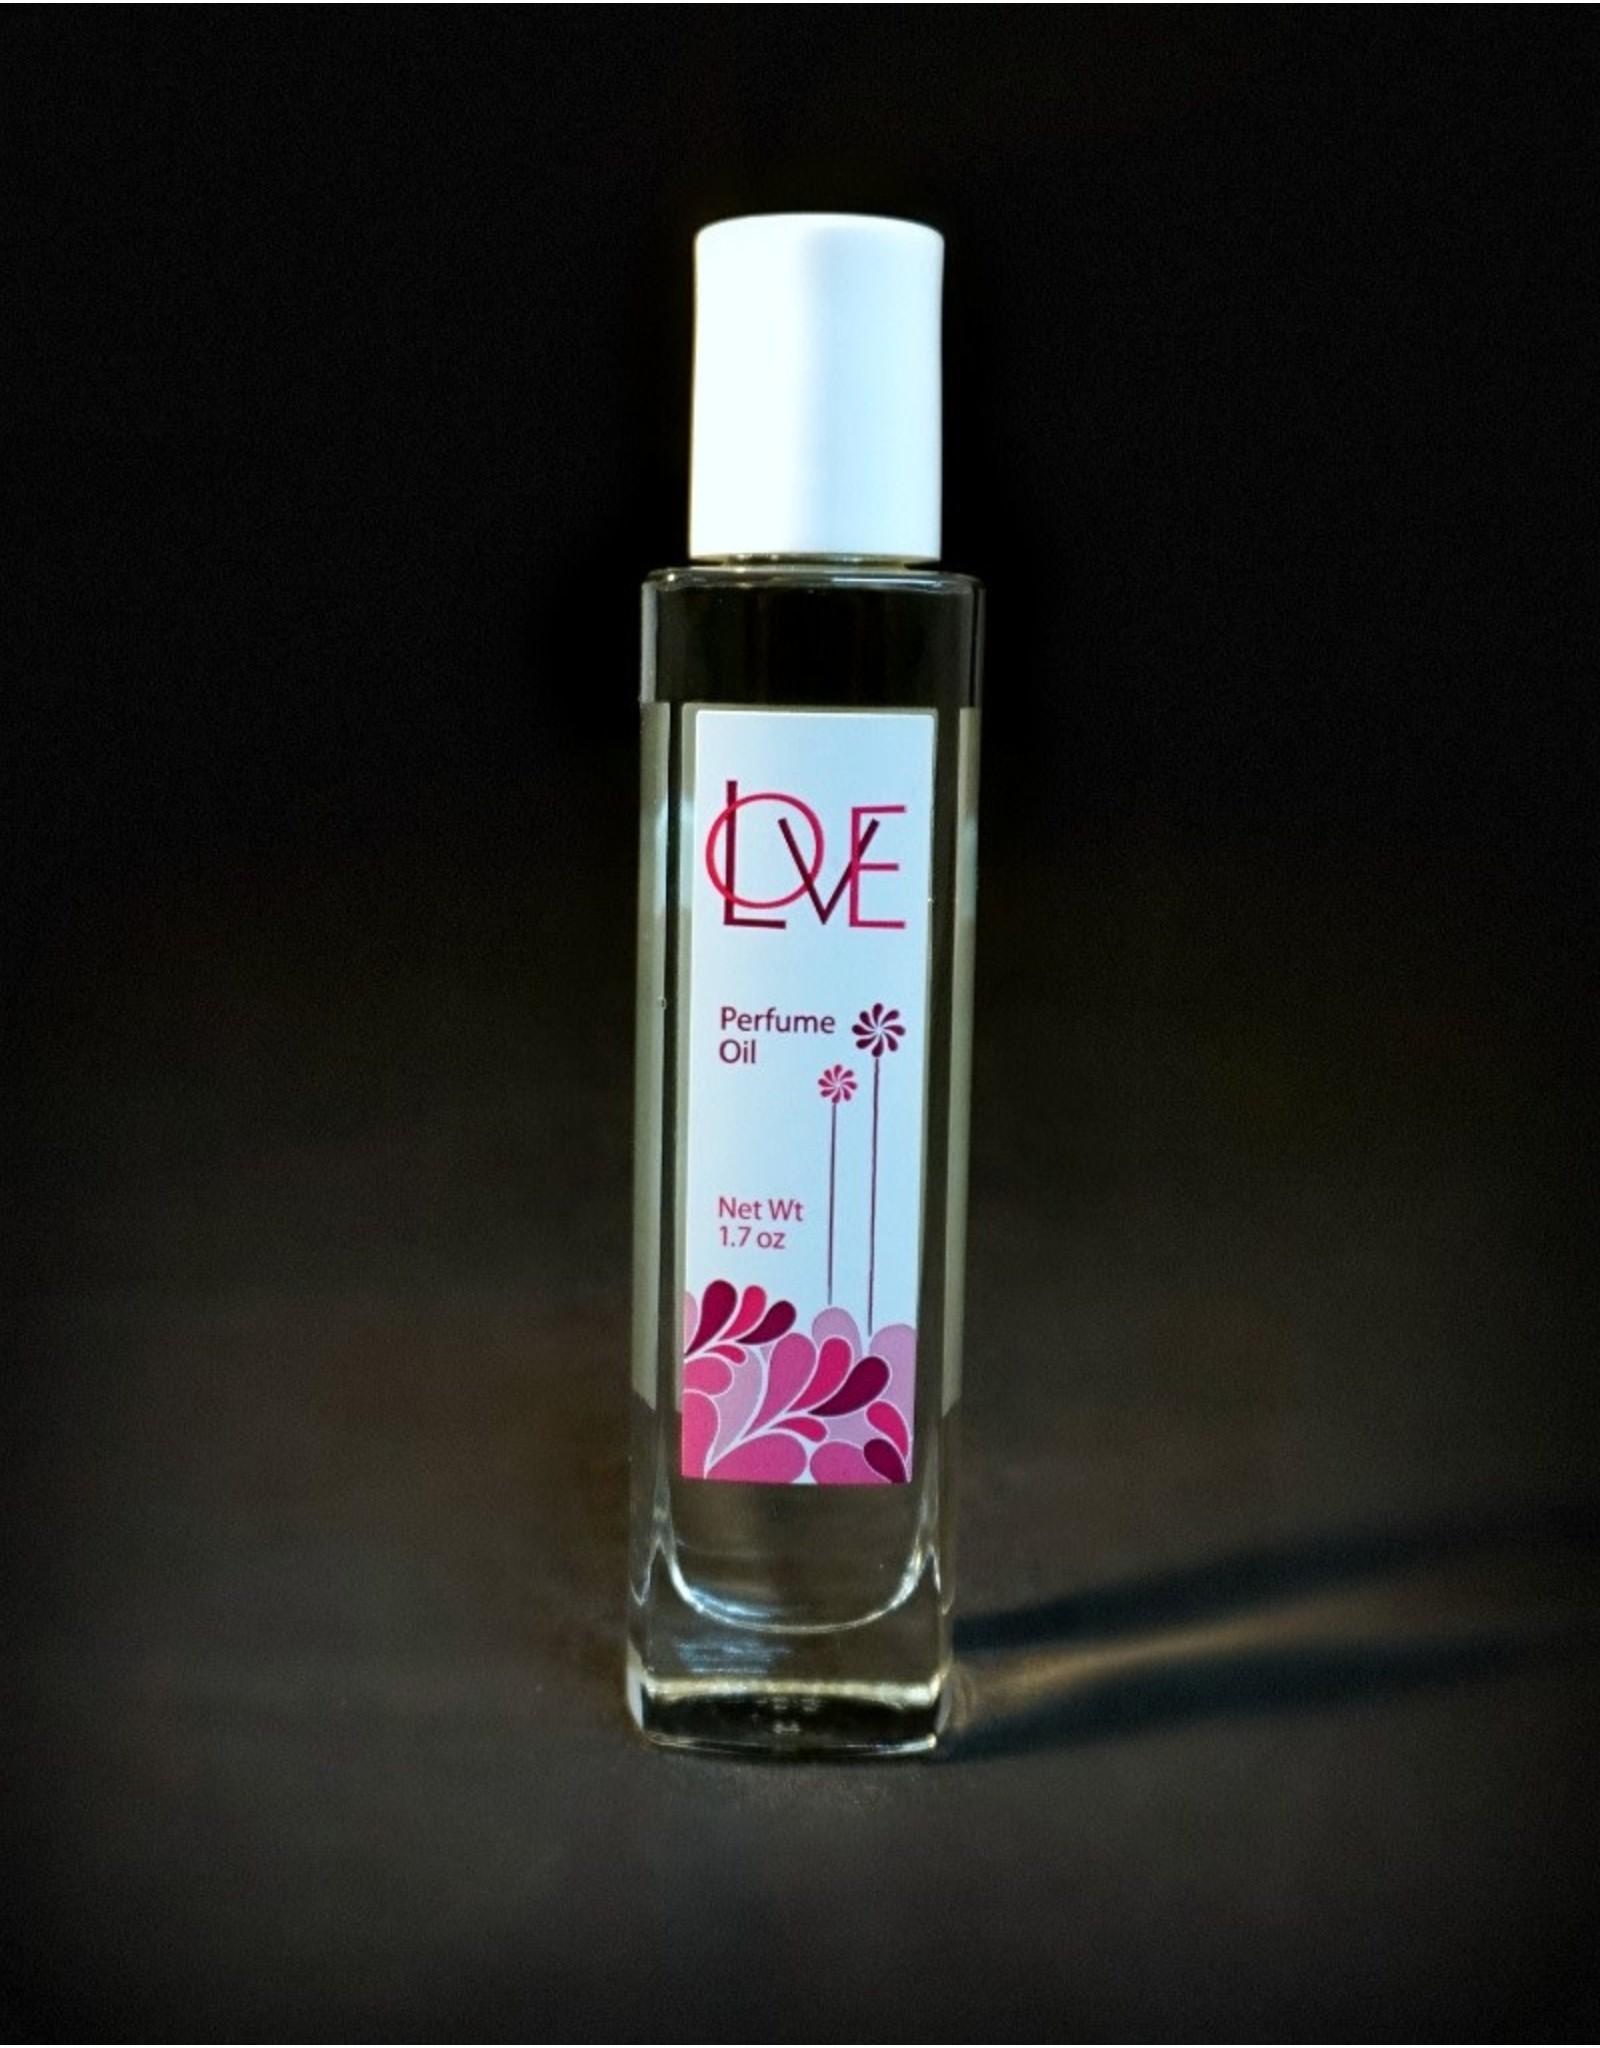 Auric Blends LOVE Perfume Oil 1.7oz